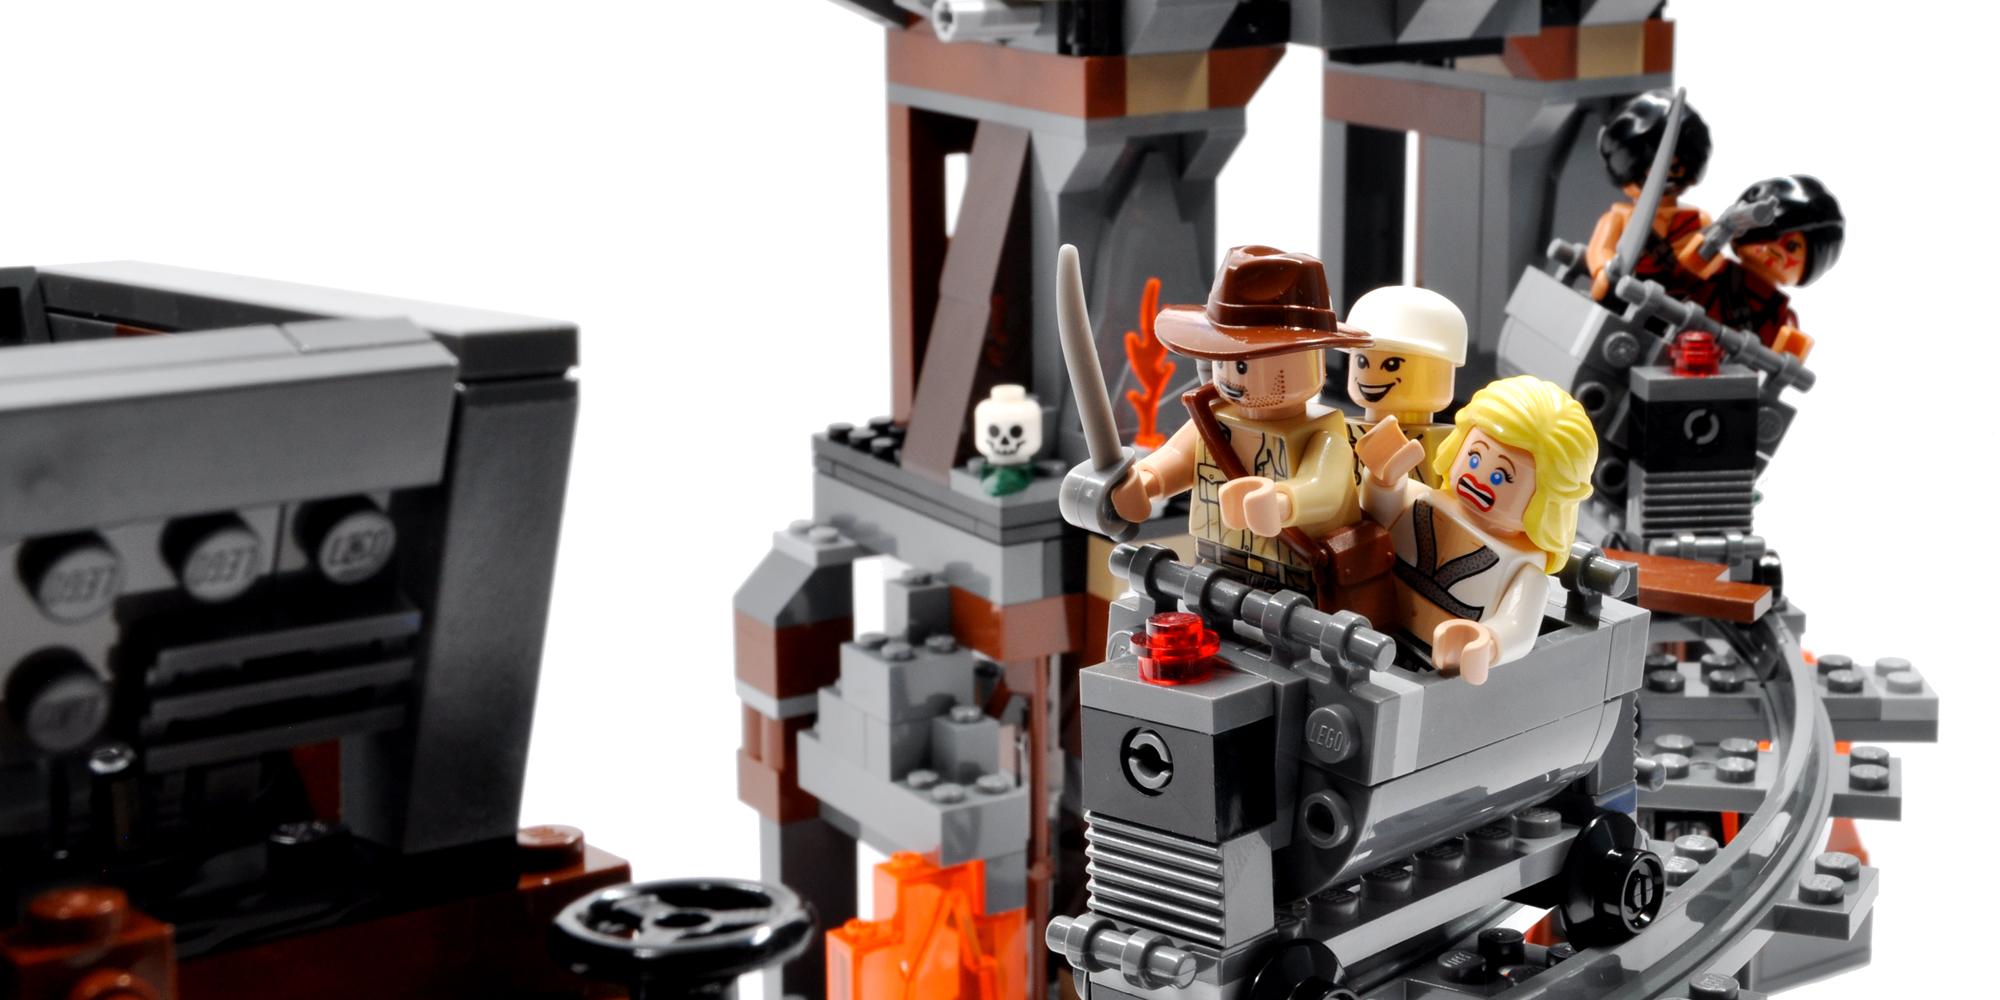 Lego 7199: The Temple of Doom